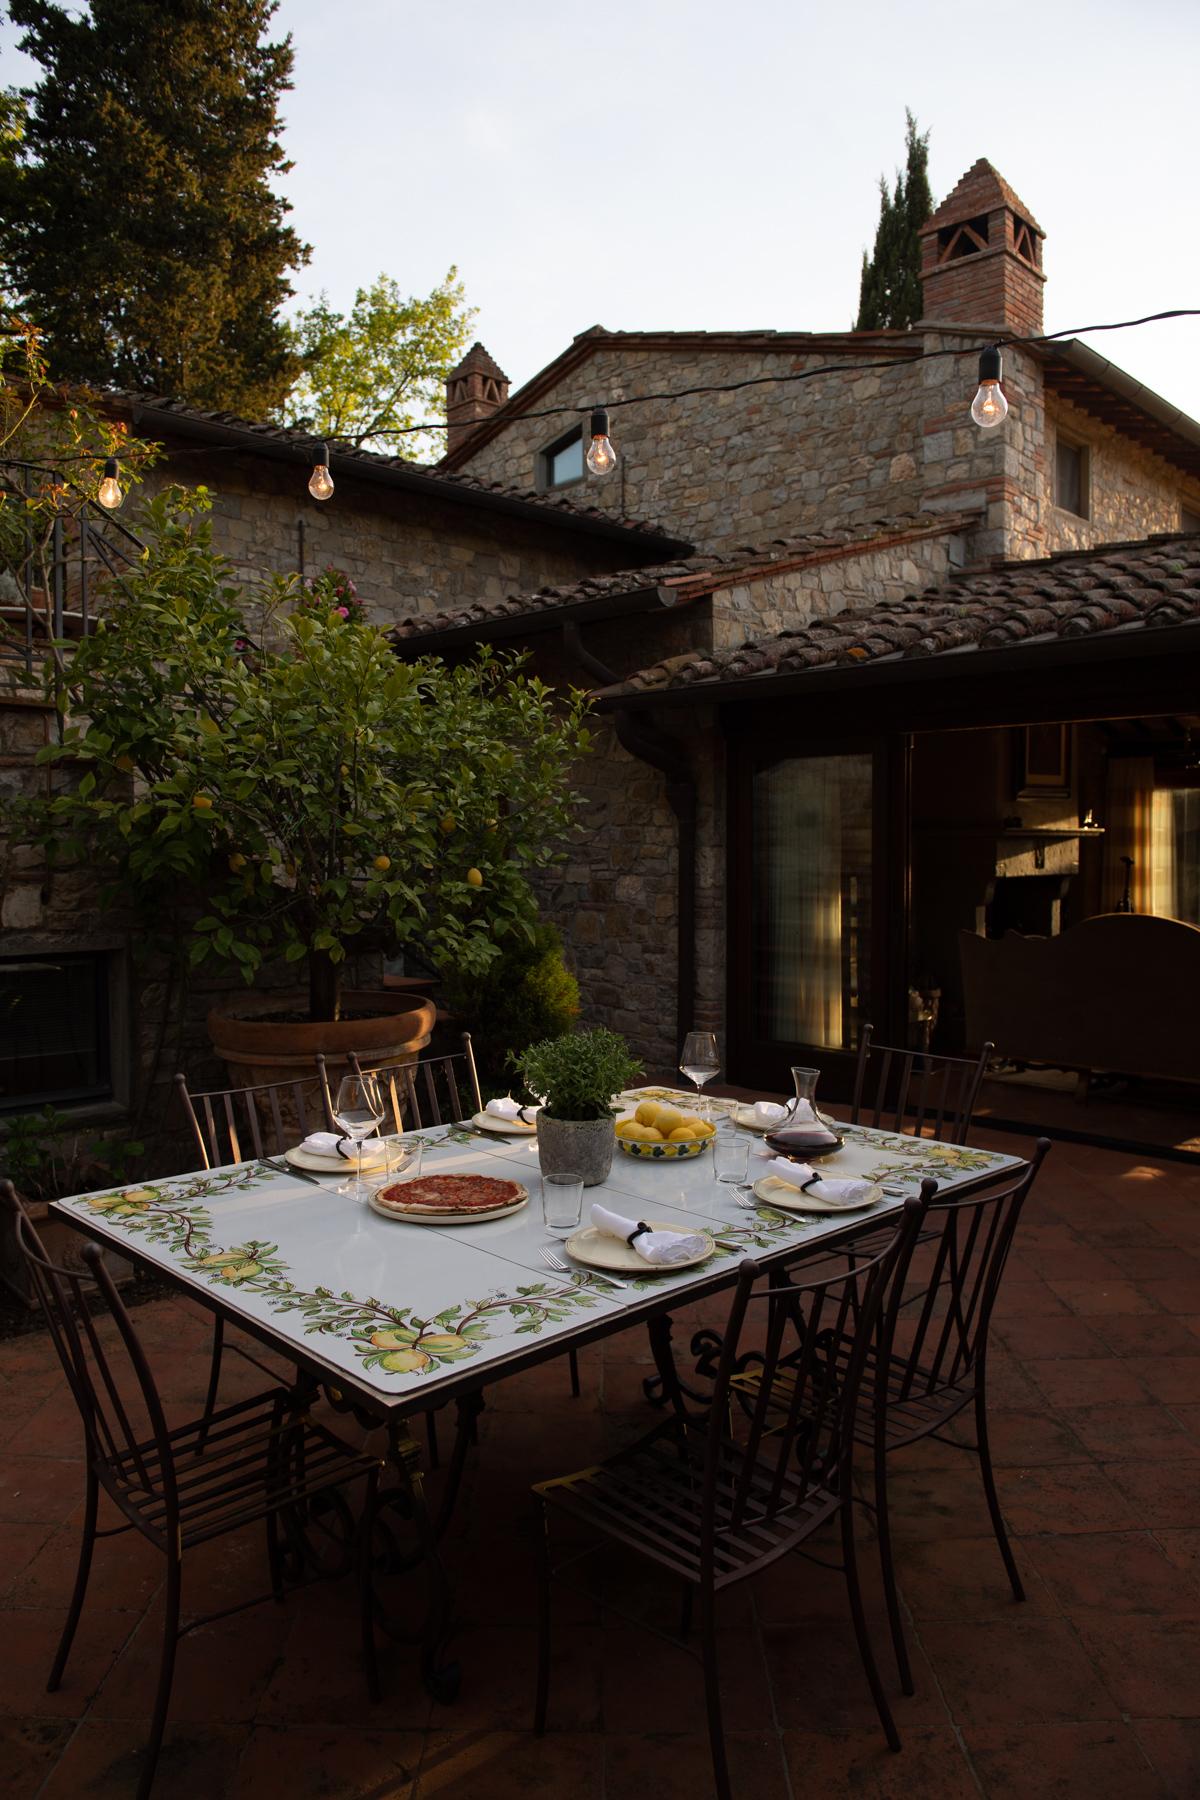 Stacie Flinner x Cuvee Tuscan Farmhouse Tuscany Italy Guide-85.jpg